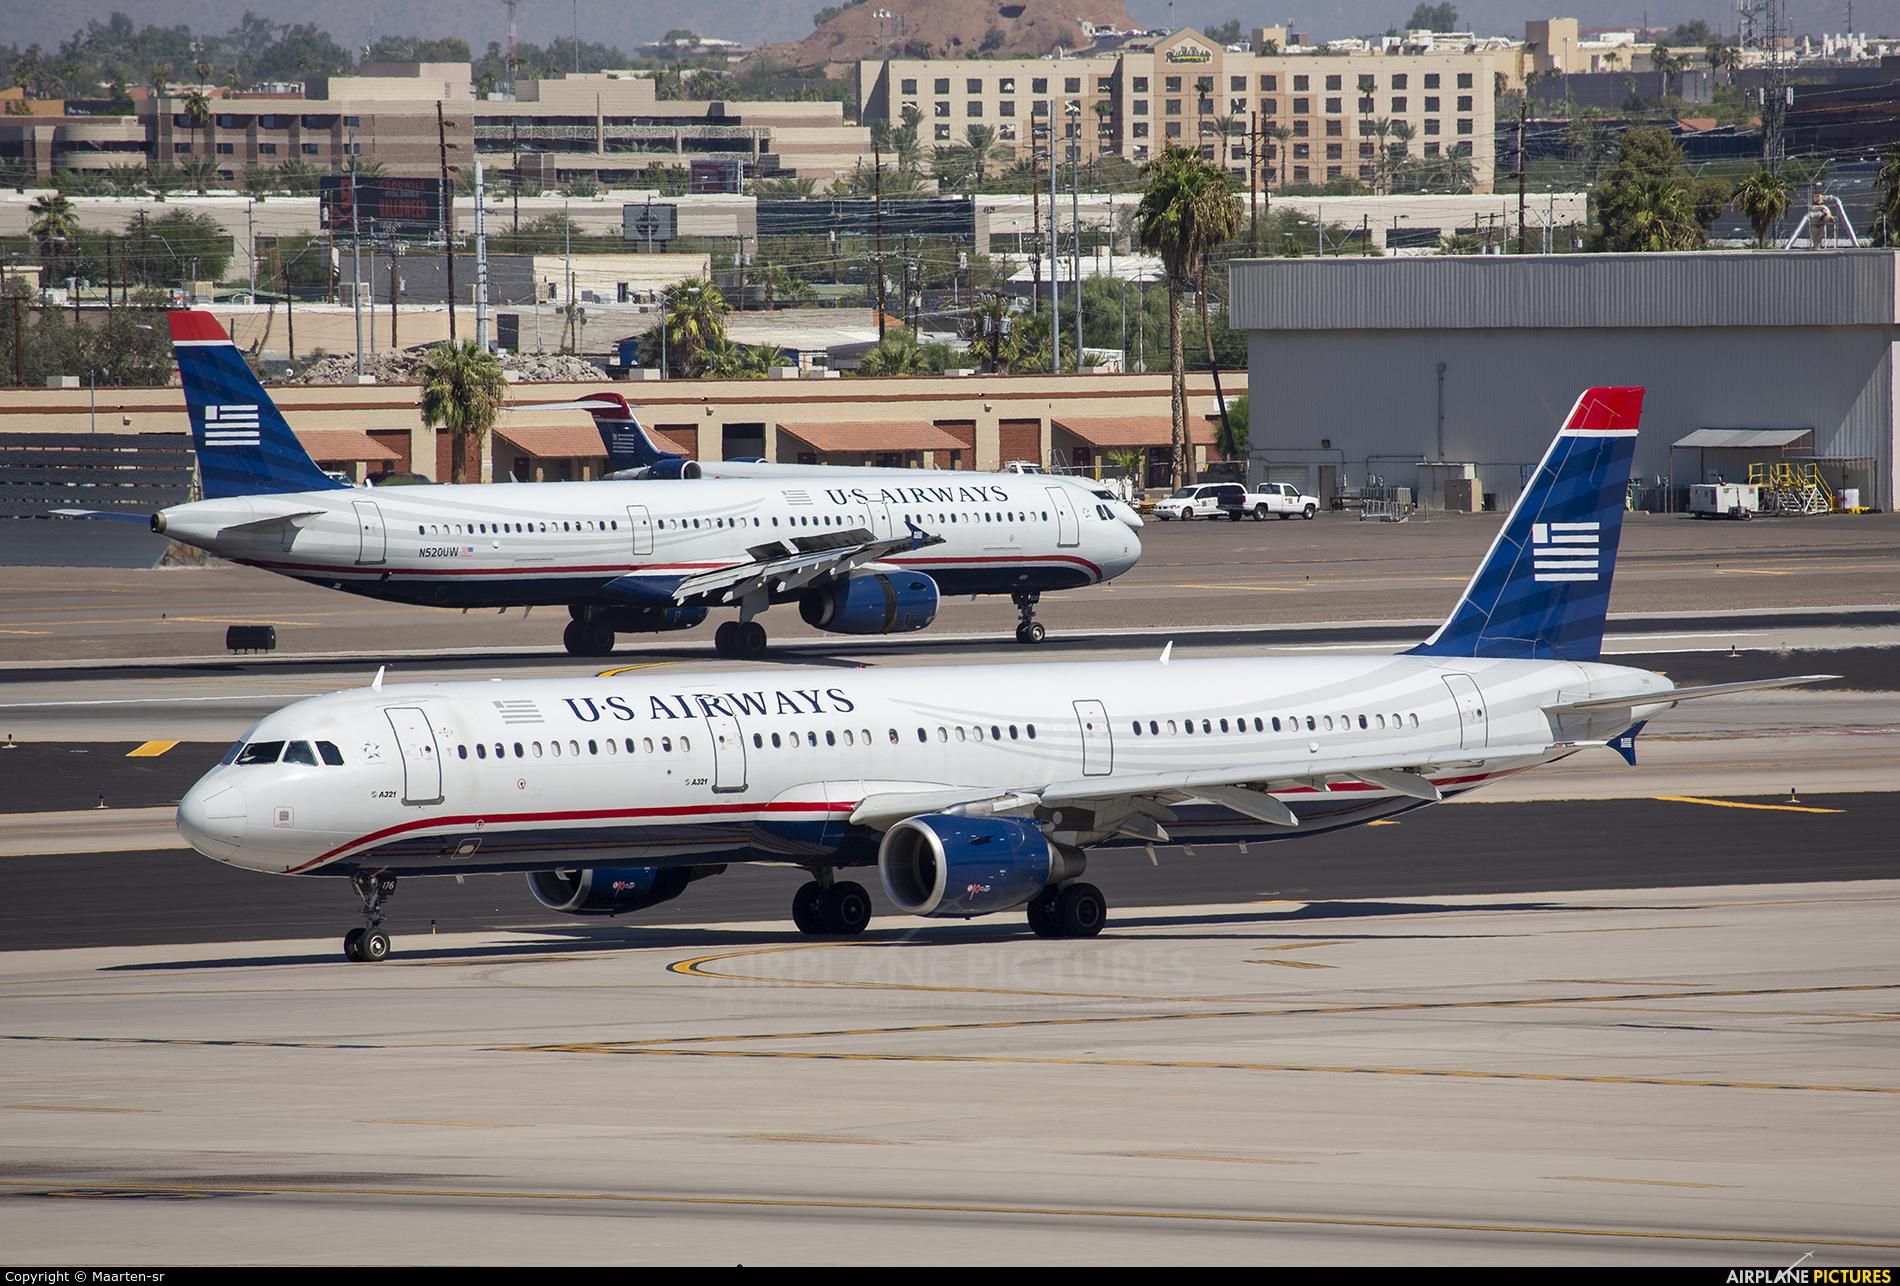 US Airways N176UW aircraft at Phoenix - Sky Harbor Intl